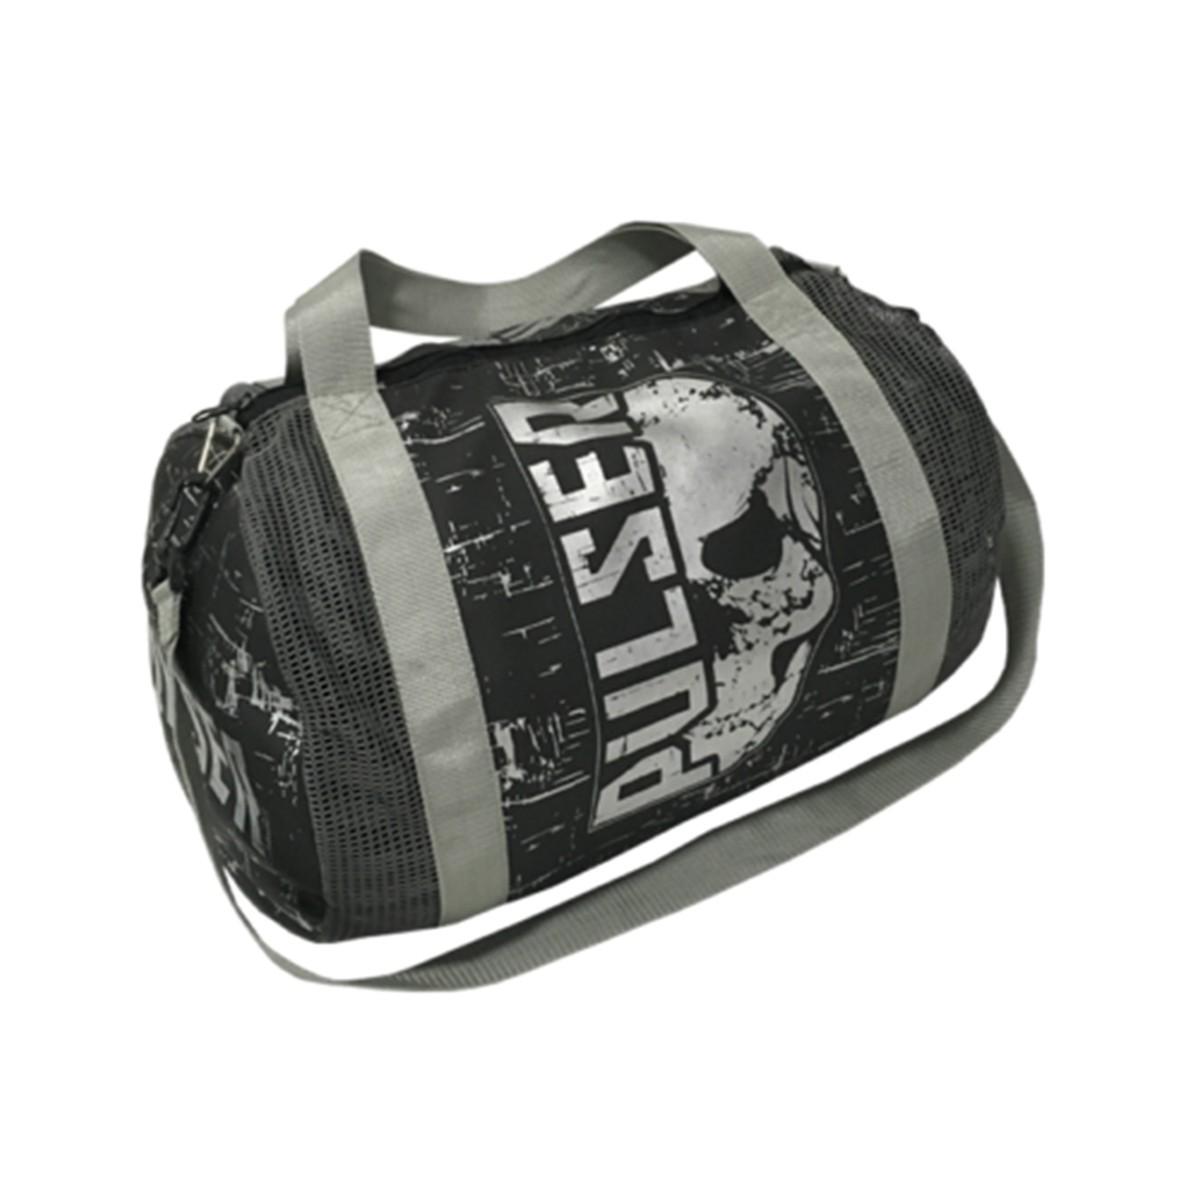 Bolsa Kimono Muay Thai Boxe Fitness Academia - Média - Preto Caveira - Pulser  - PRALUTA SHOP